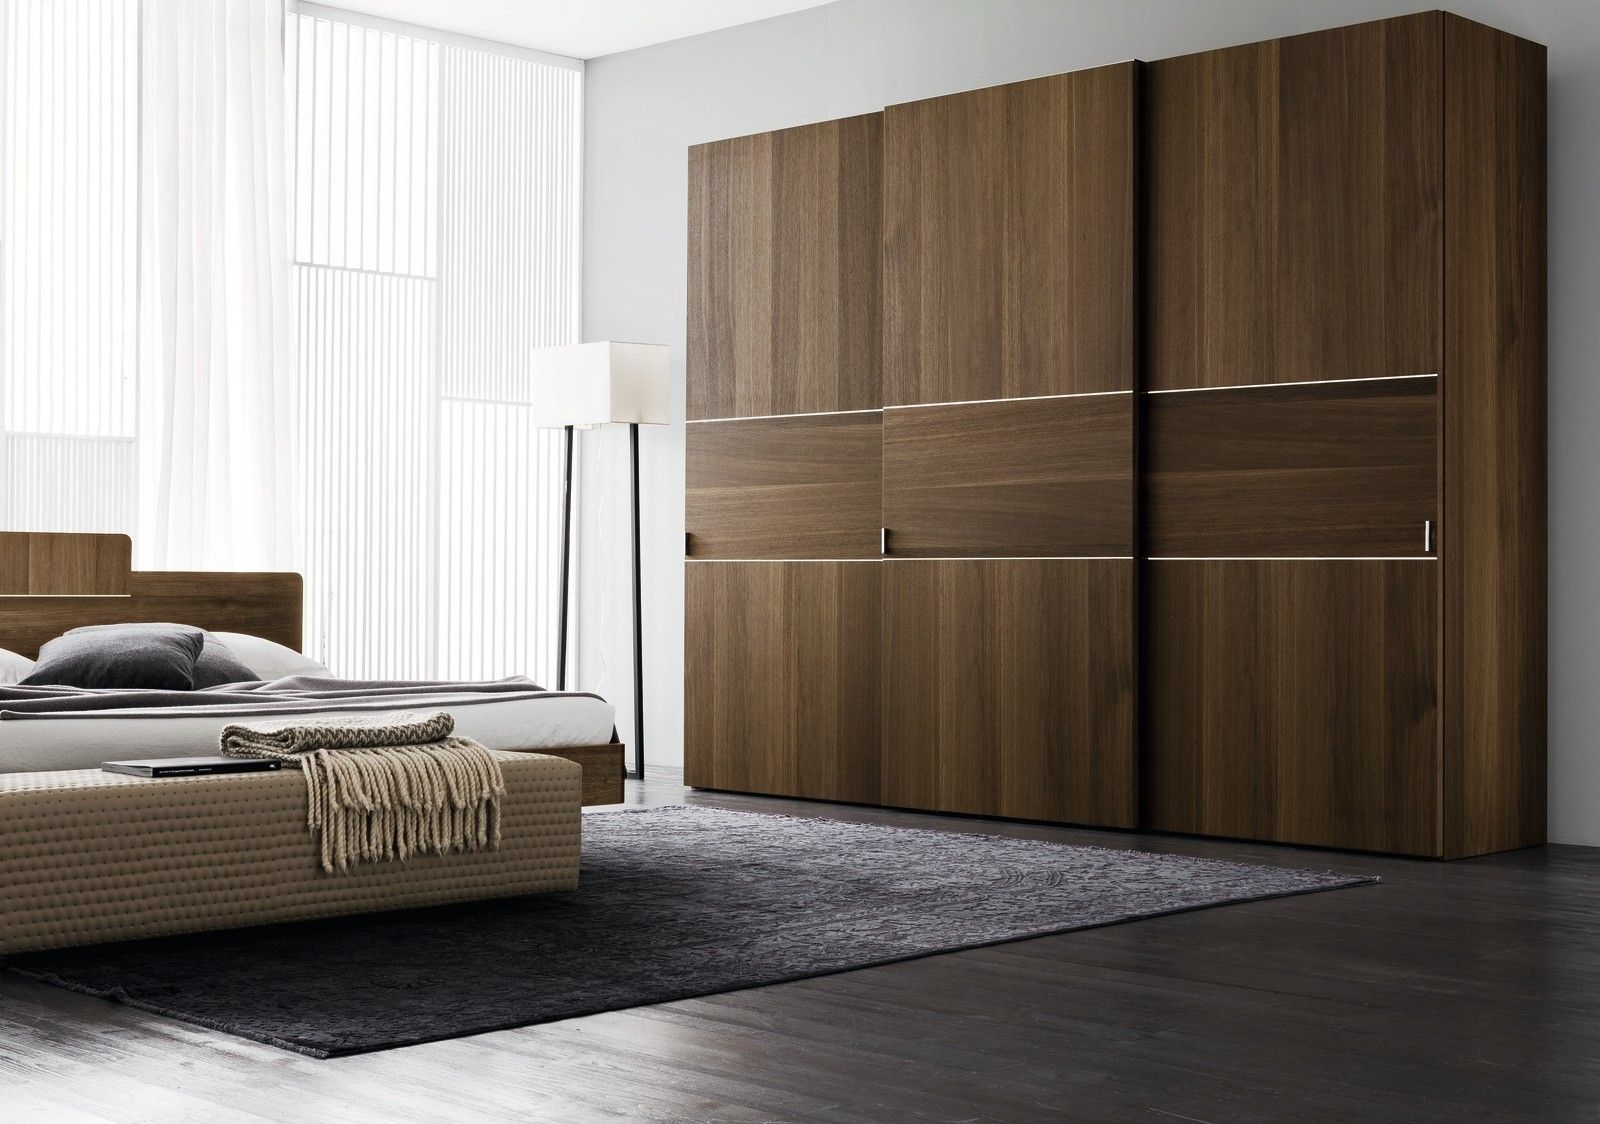 Oak Finish Three Door Sliding Wardrobe Design Id564 Three Door Sliding Wardrobe Des Wardrobe Design Bedroom Sliding Wardrobe Designs Bedroom Furniture Design